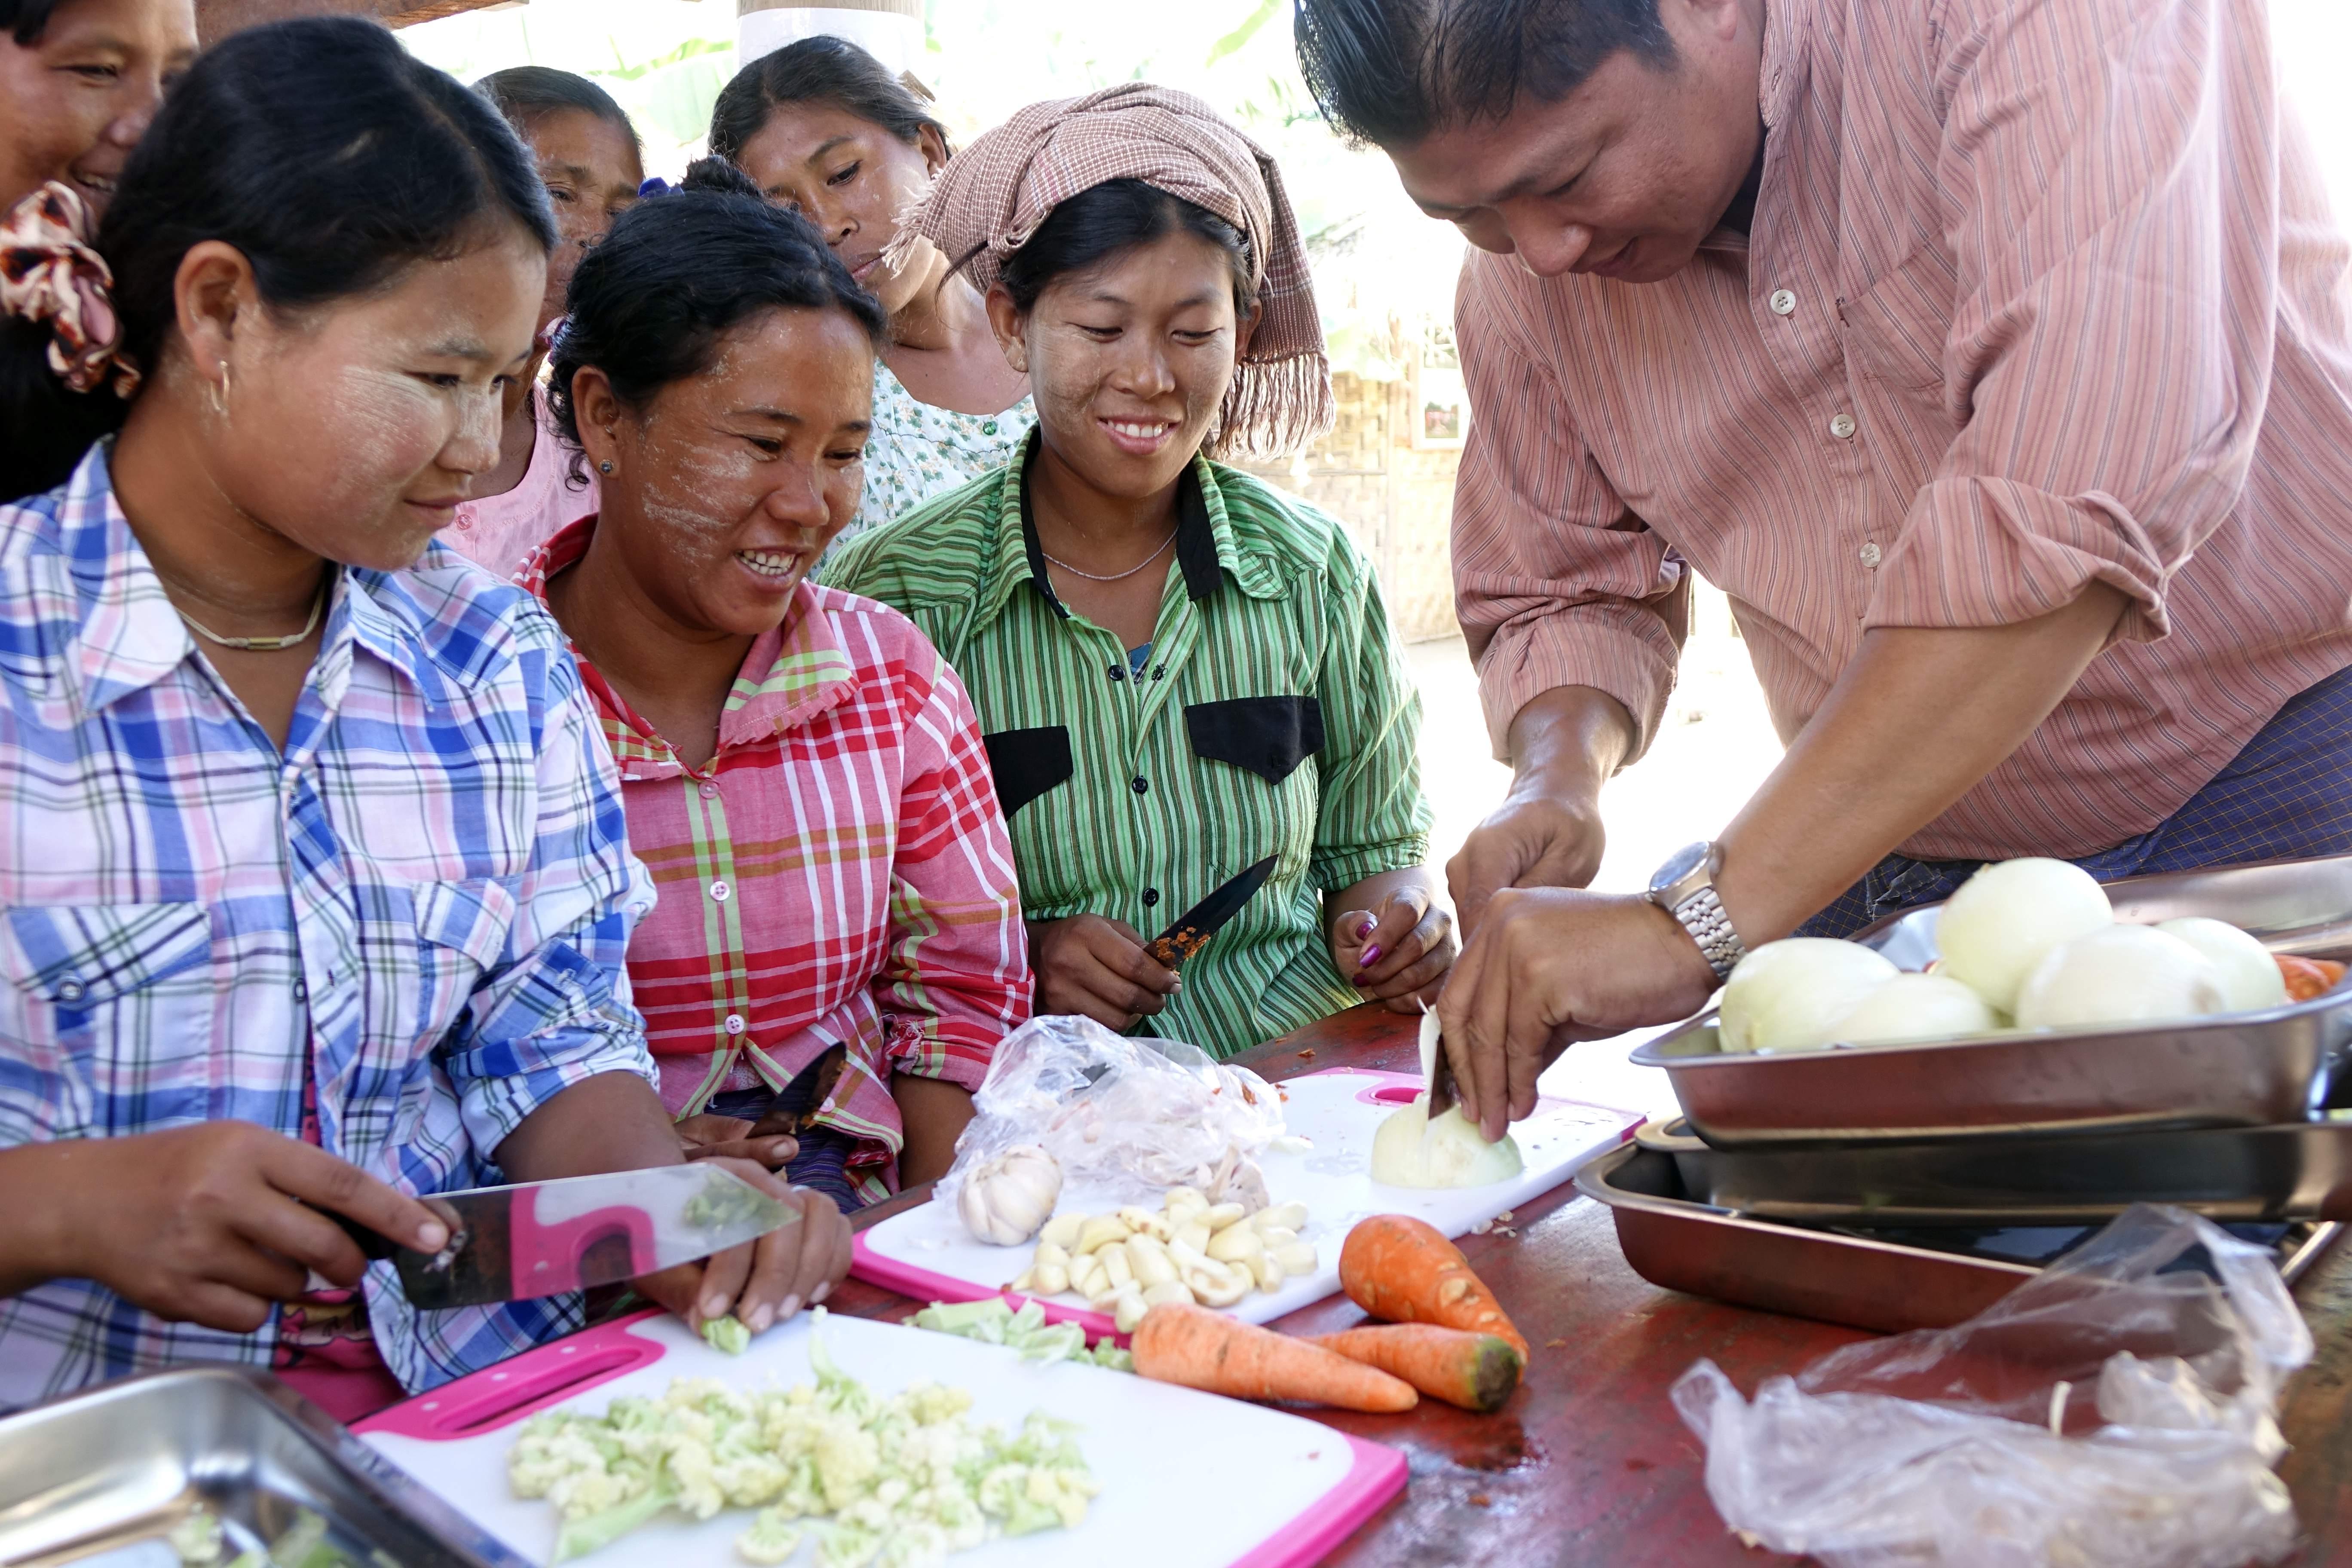 Myanmar 21012 8 Aung Ko Toe gives a cooking class in Myitkangyi, Credit Paul Bates